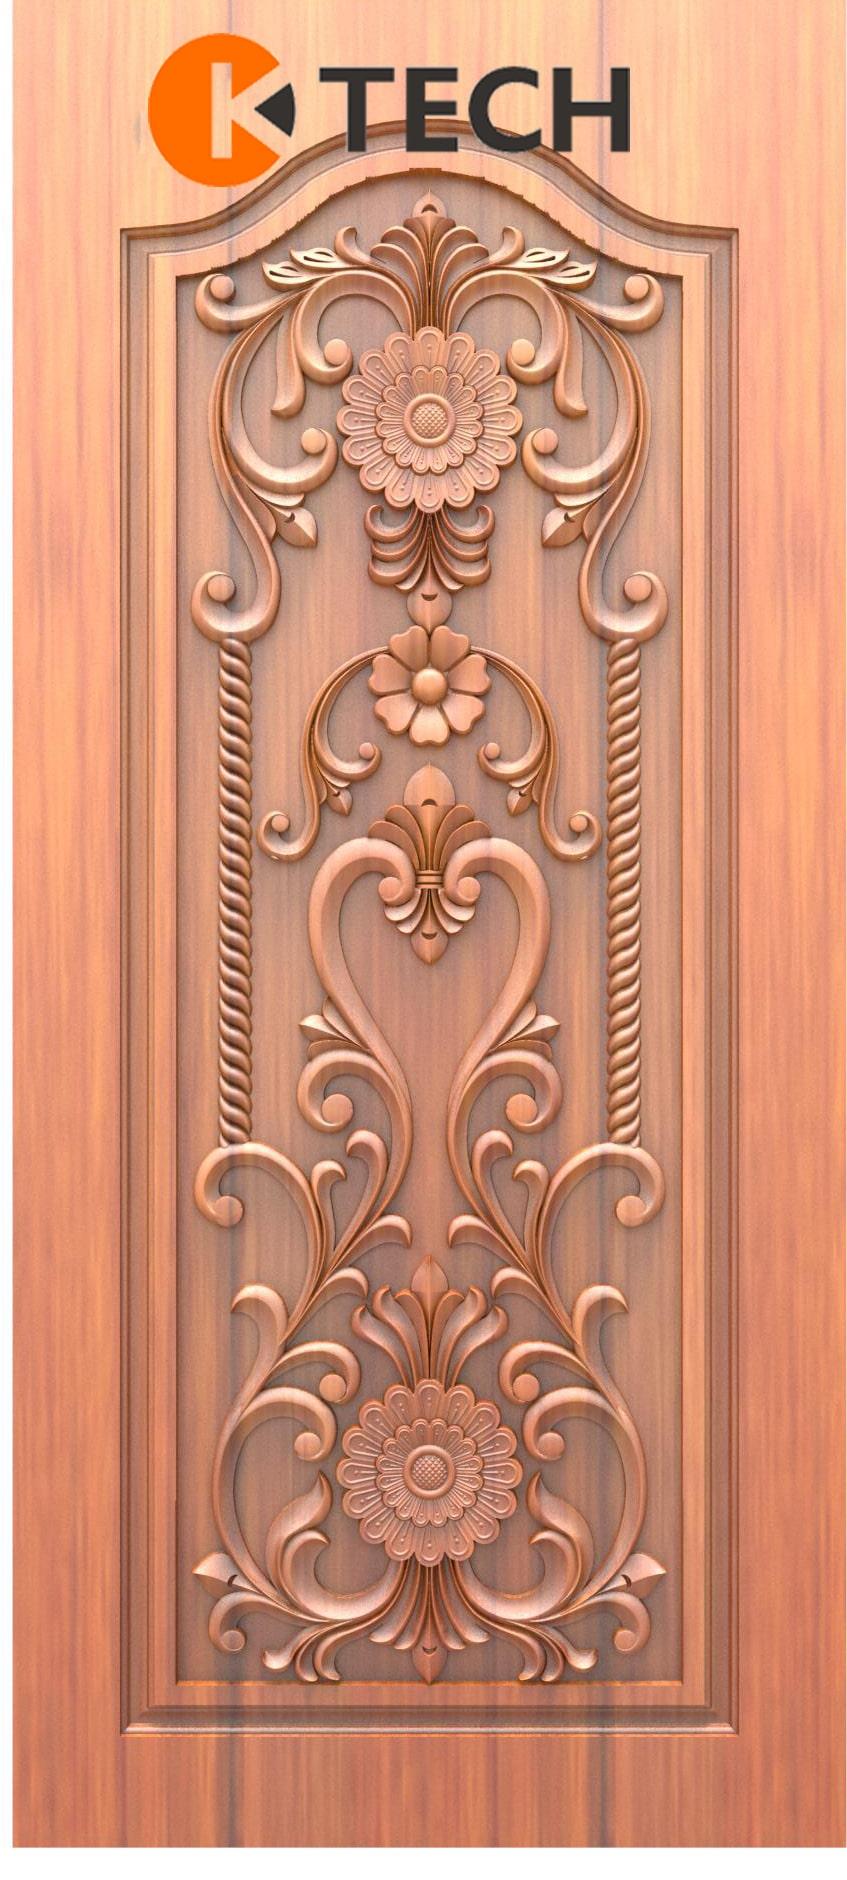 K-TECH CNC Doors Design 193